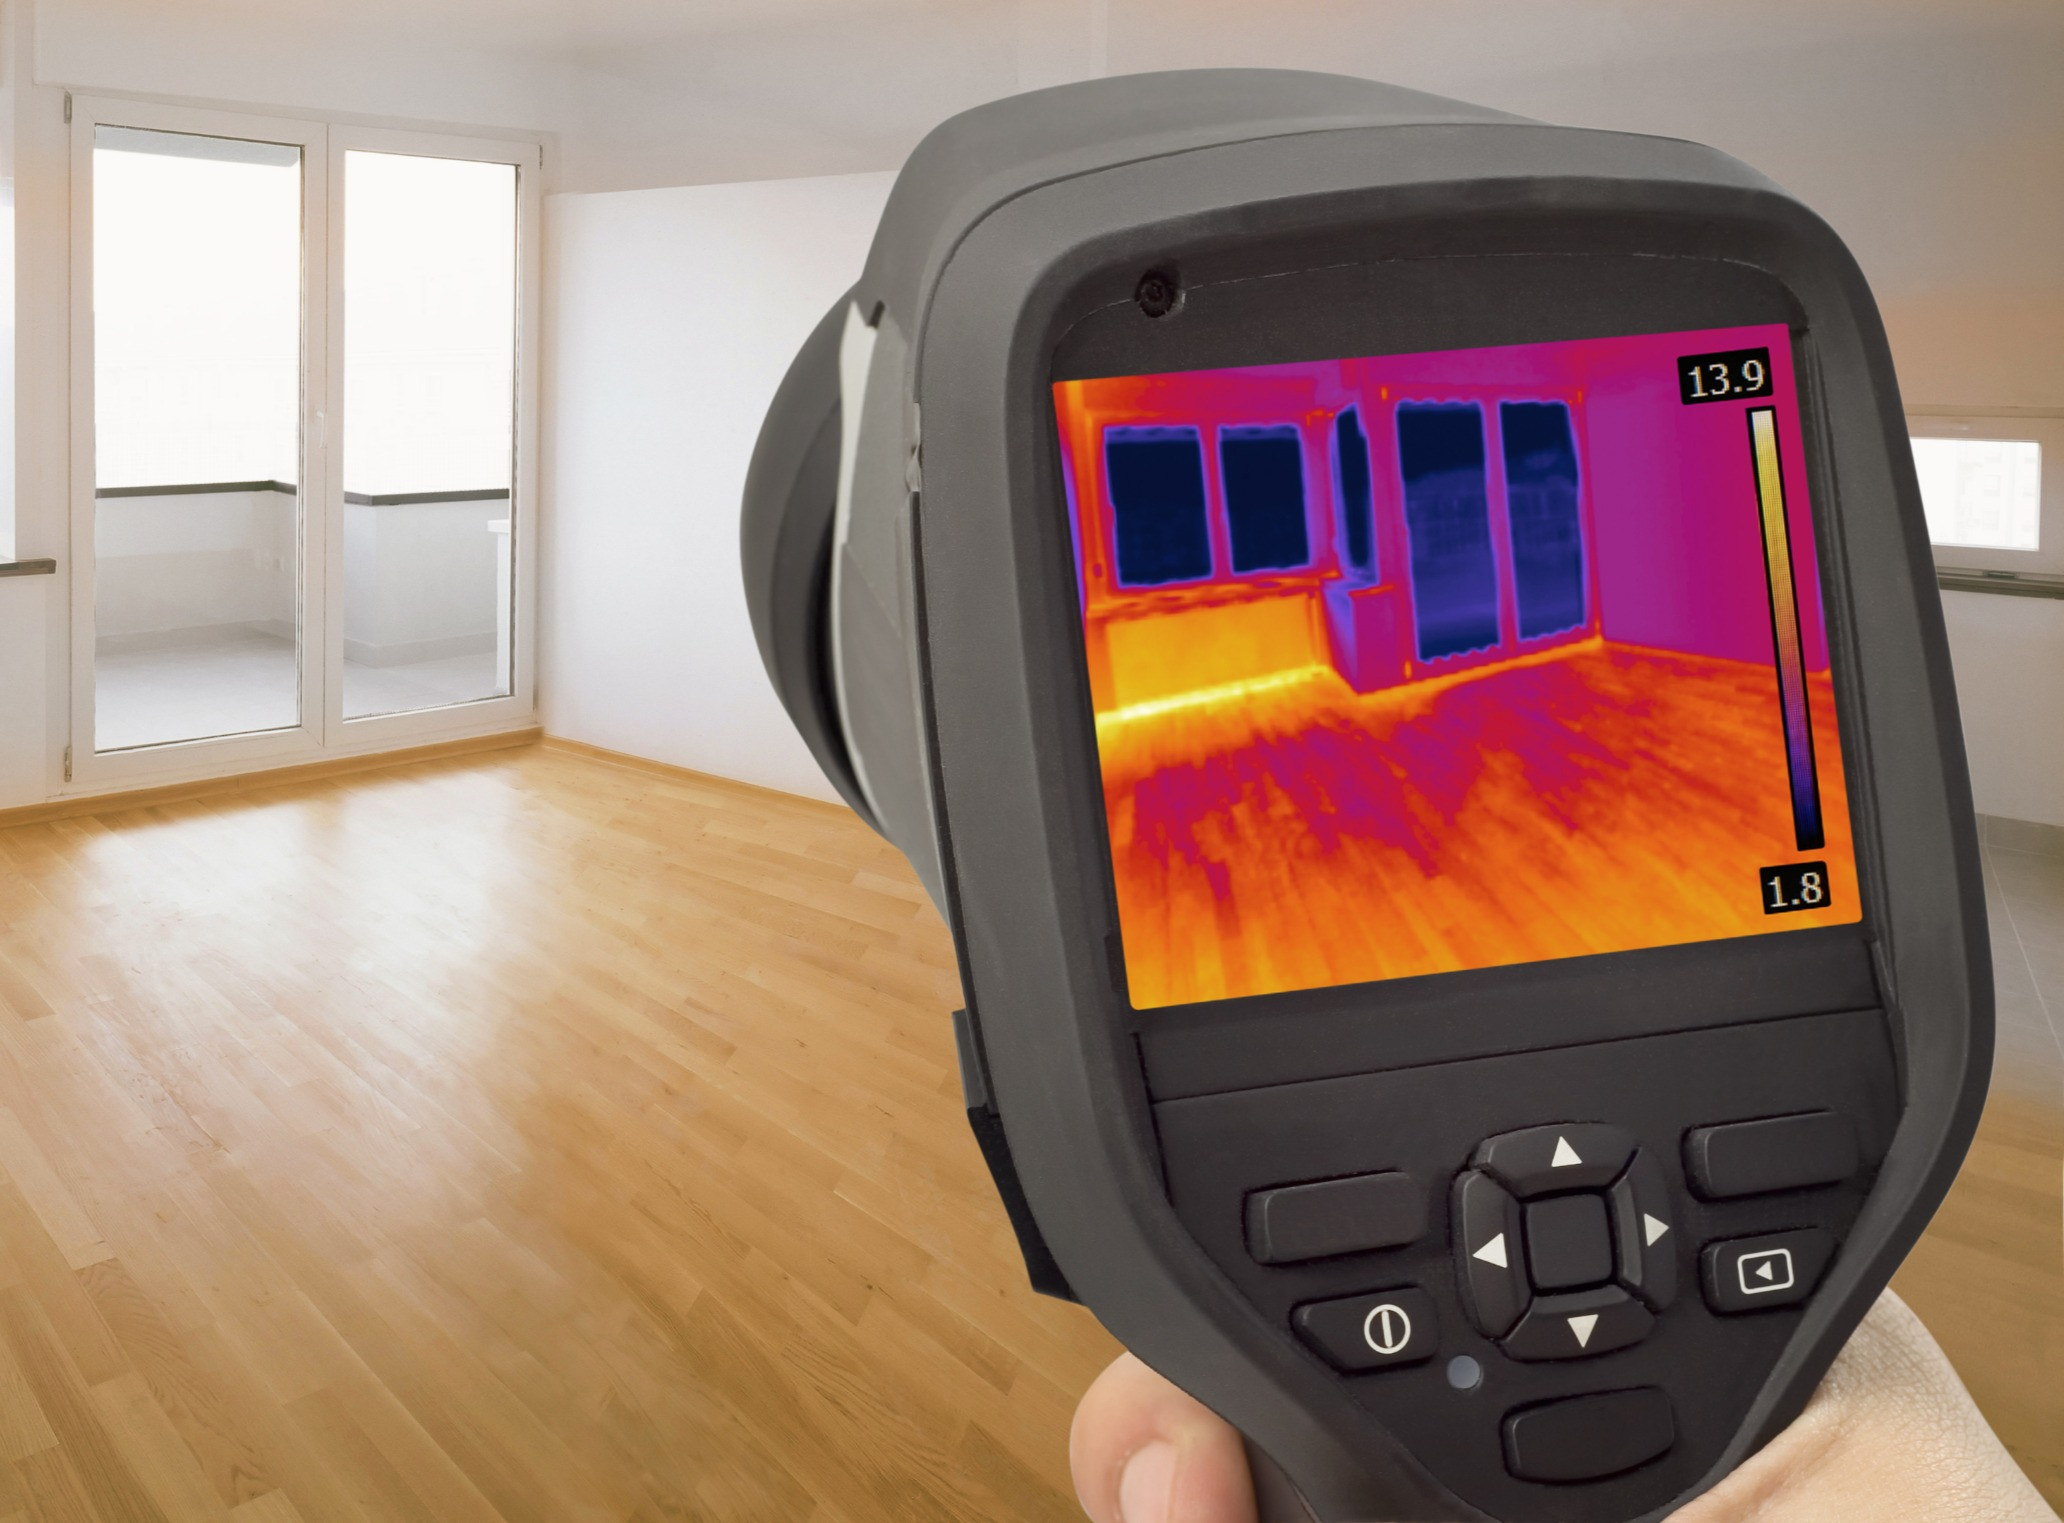 Thermal Imaging - Coming Soon